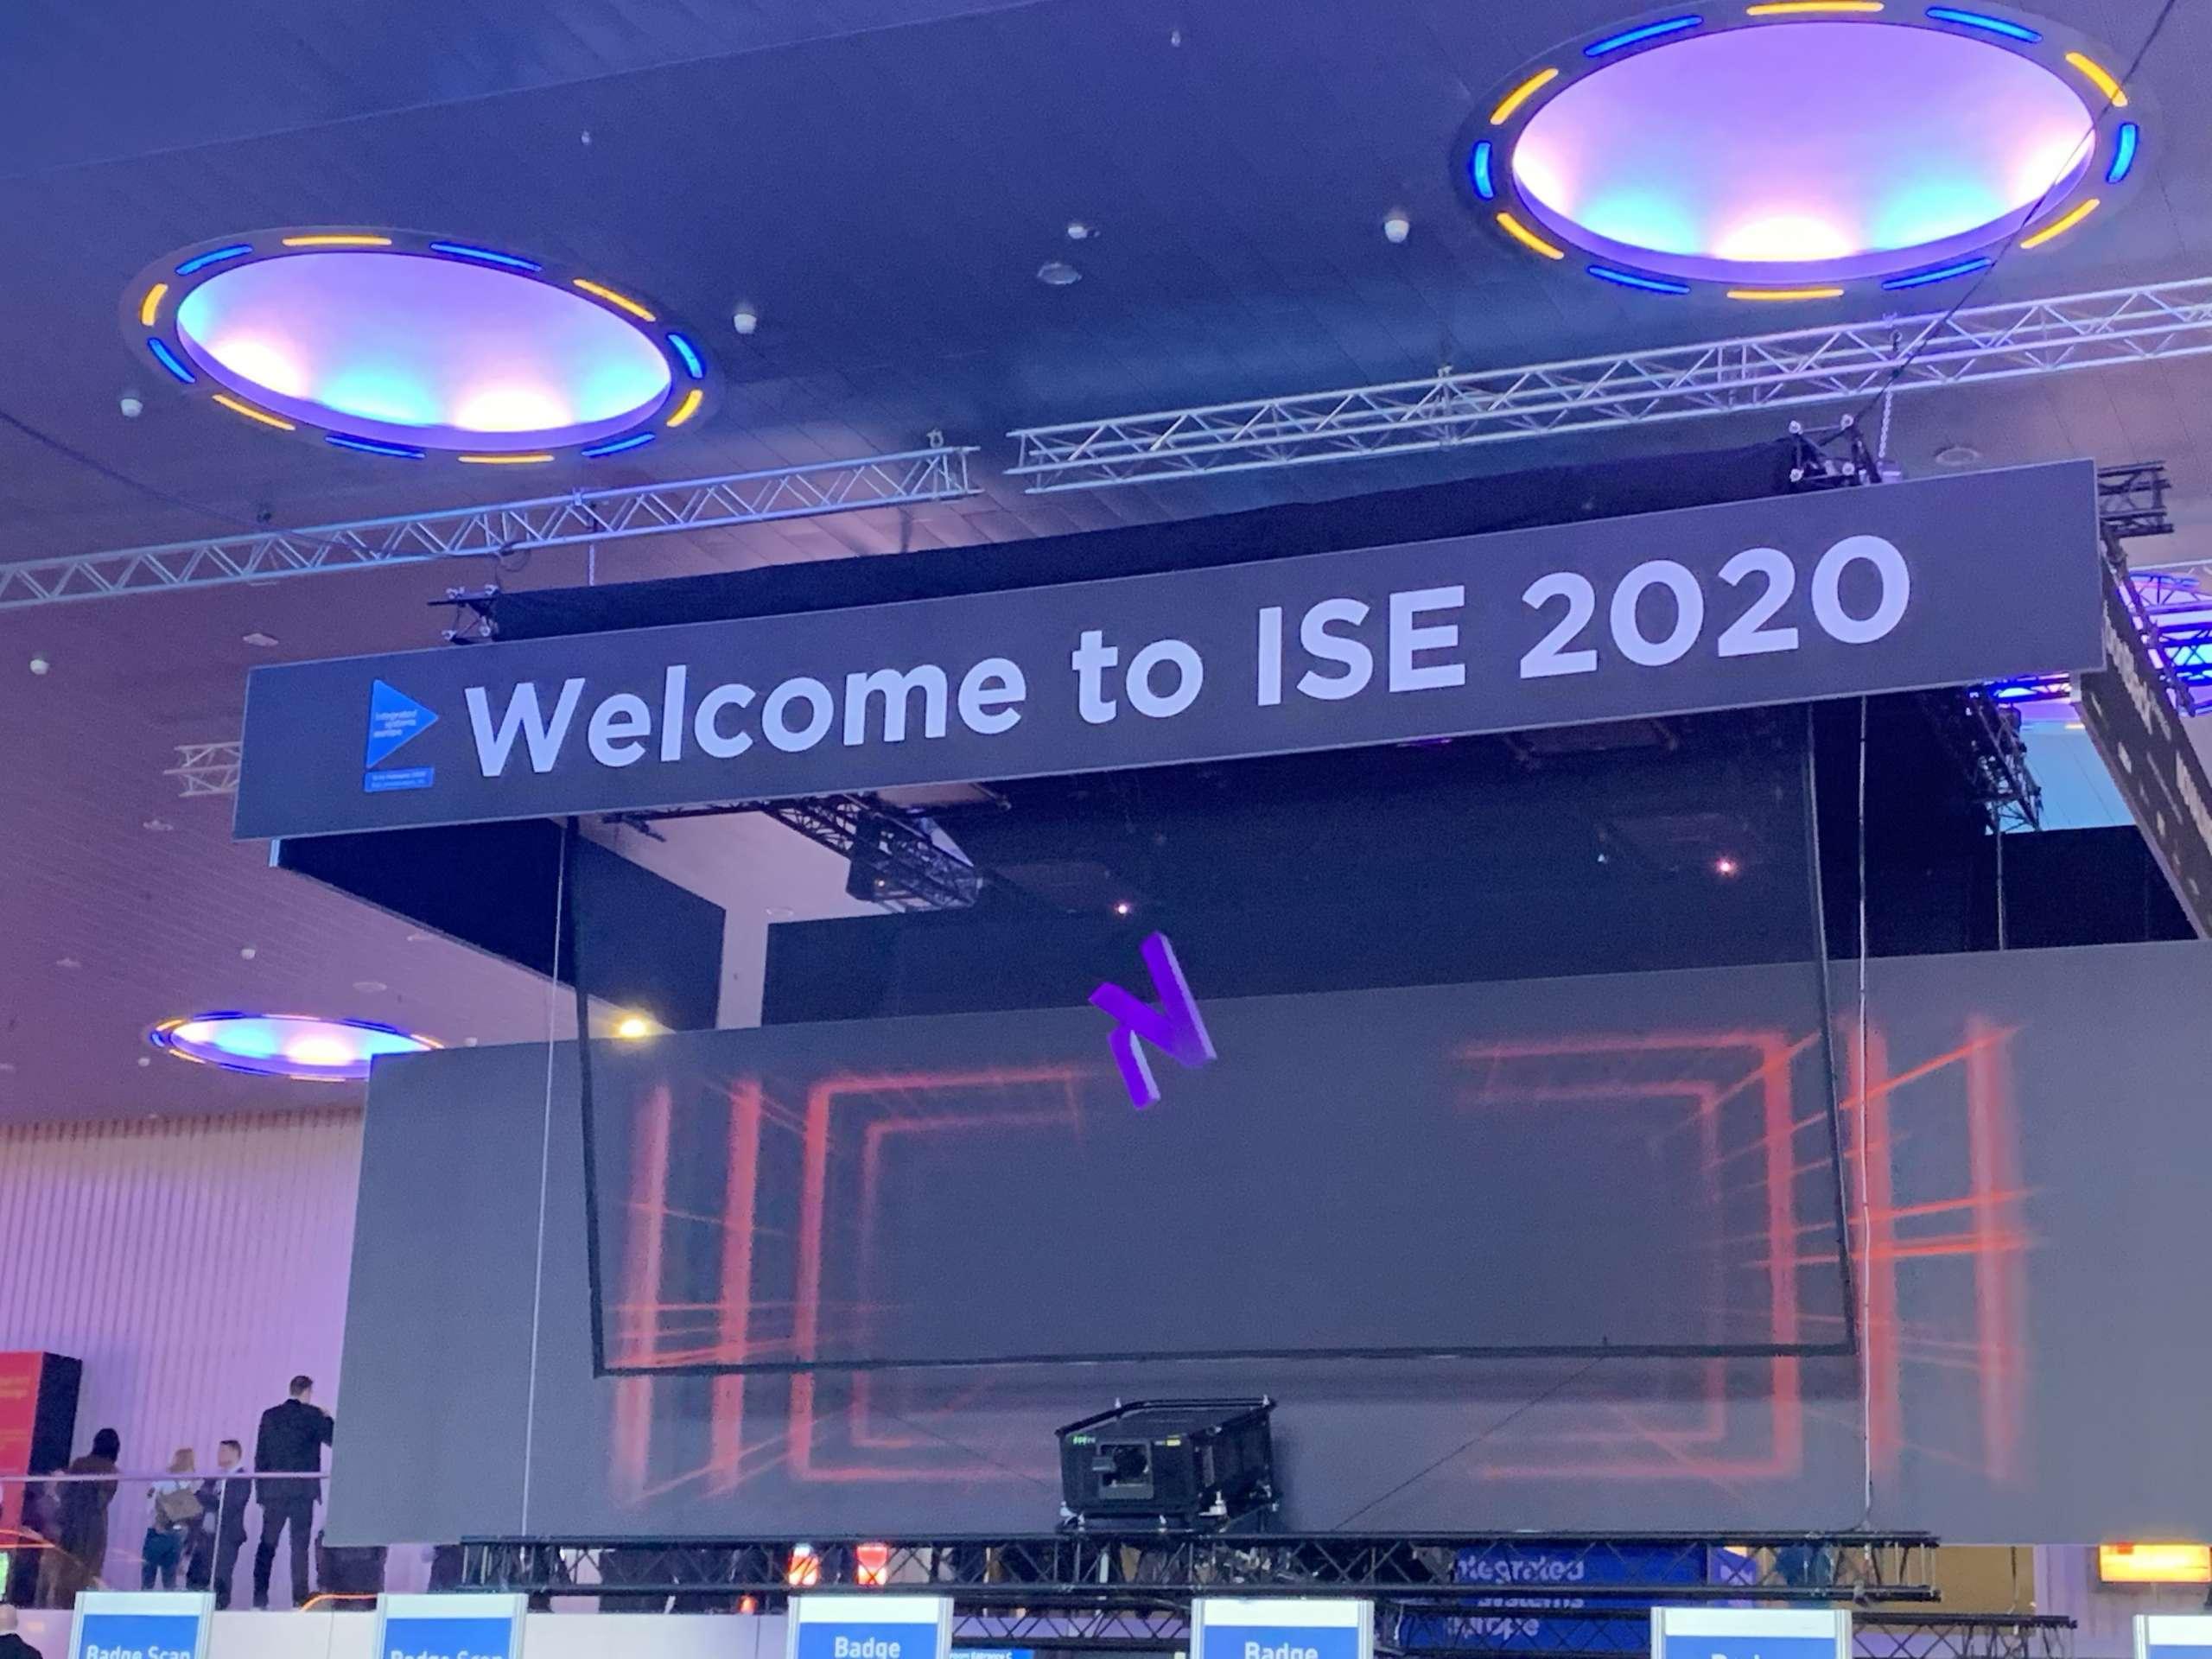 ISE 2020